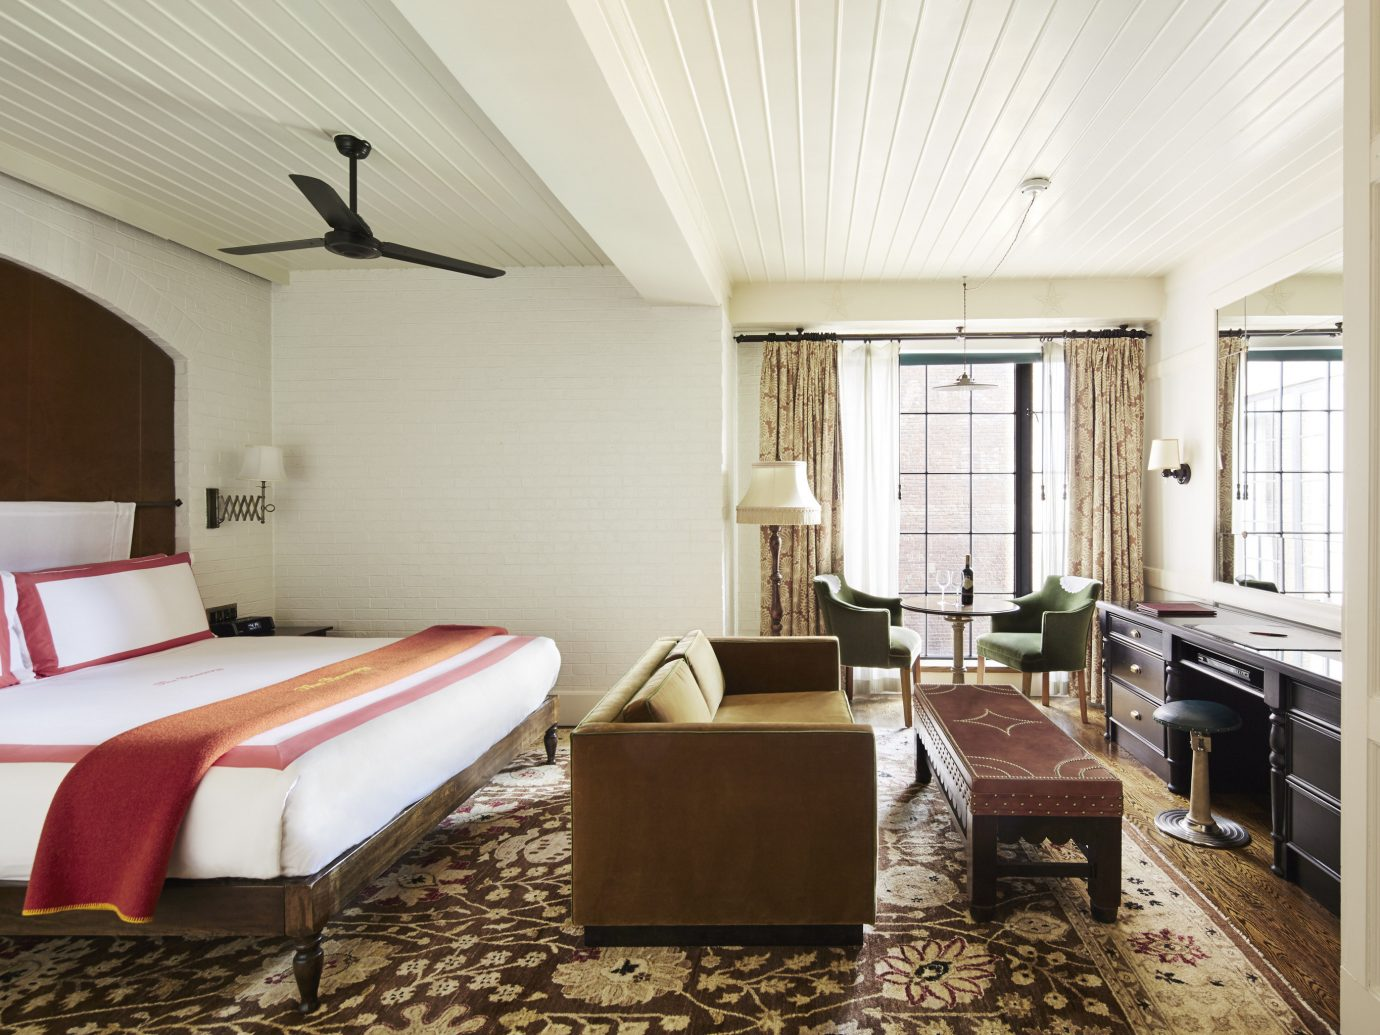 Celebs Hotels Trip Ideas indoor floor room wall ceiling interior design Living Suite Bedroom real estate hotel furniture interior designer flooring window